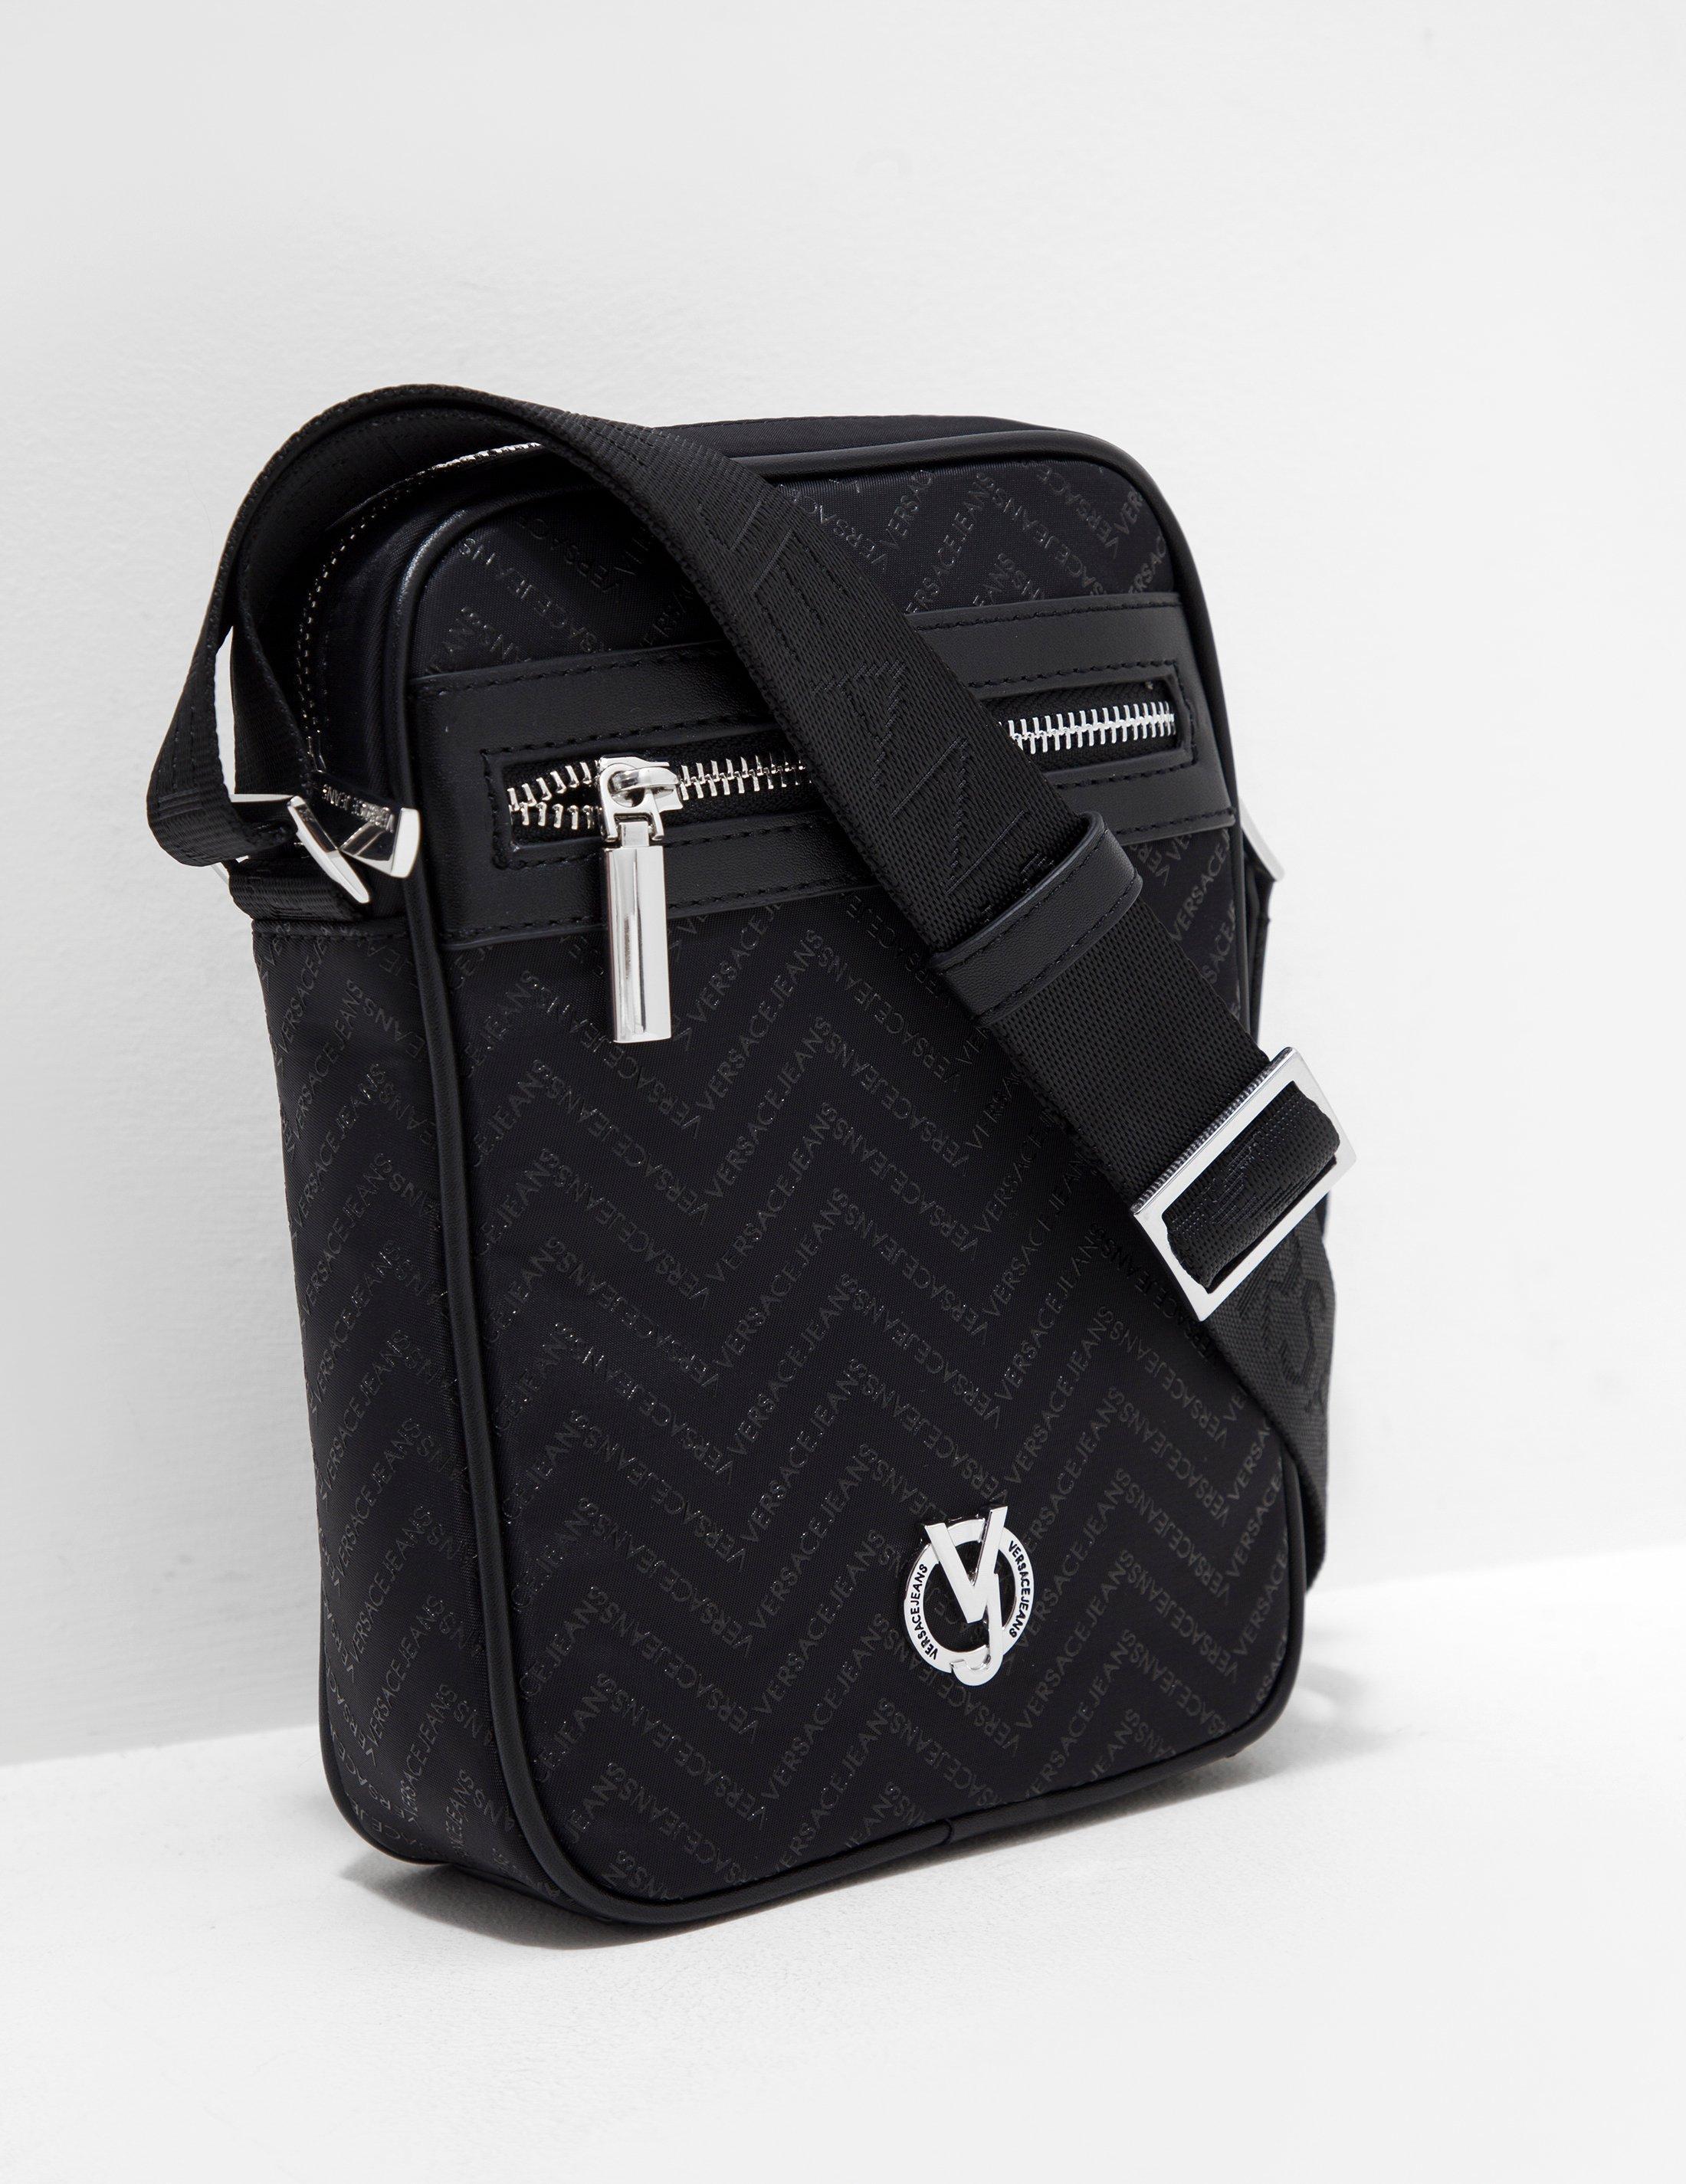 Versace Jeans Chevron Monogram Crossbody Bag in Black for Men - Lyst 944c3c57d3da0